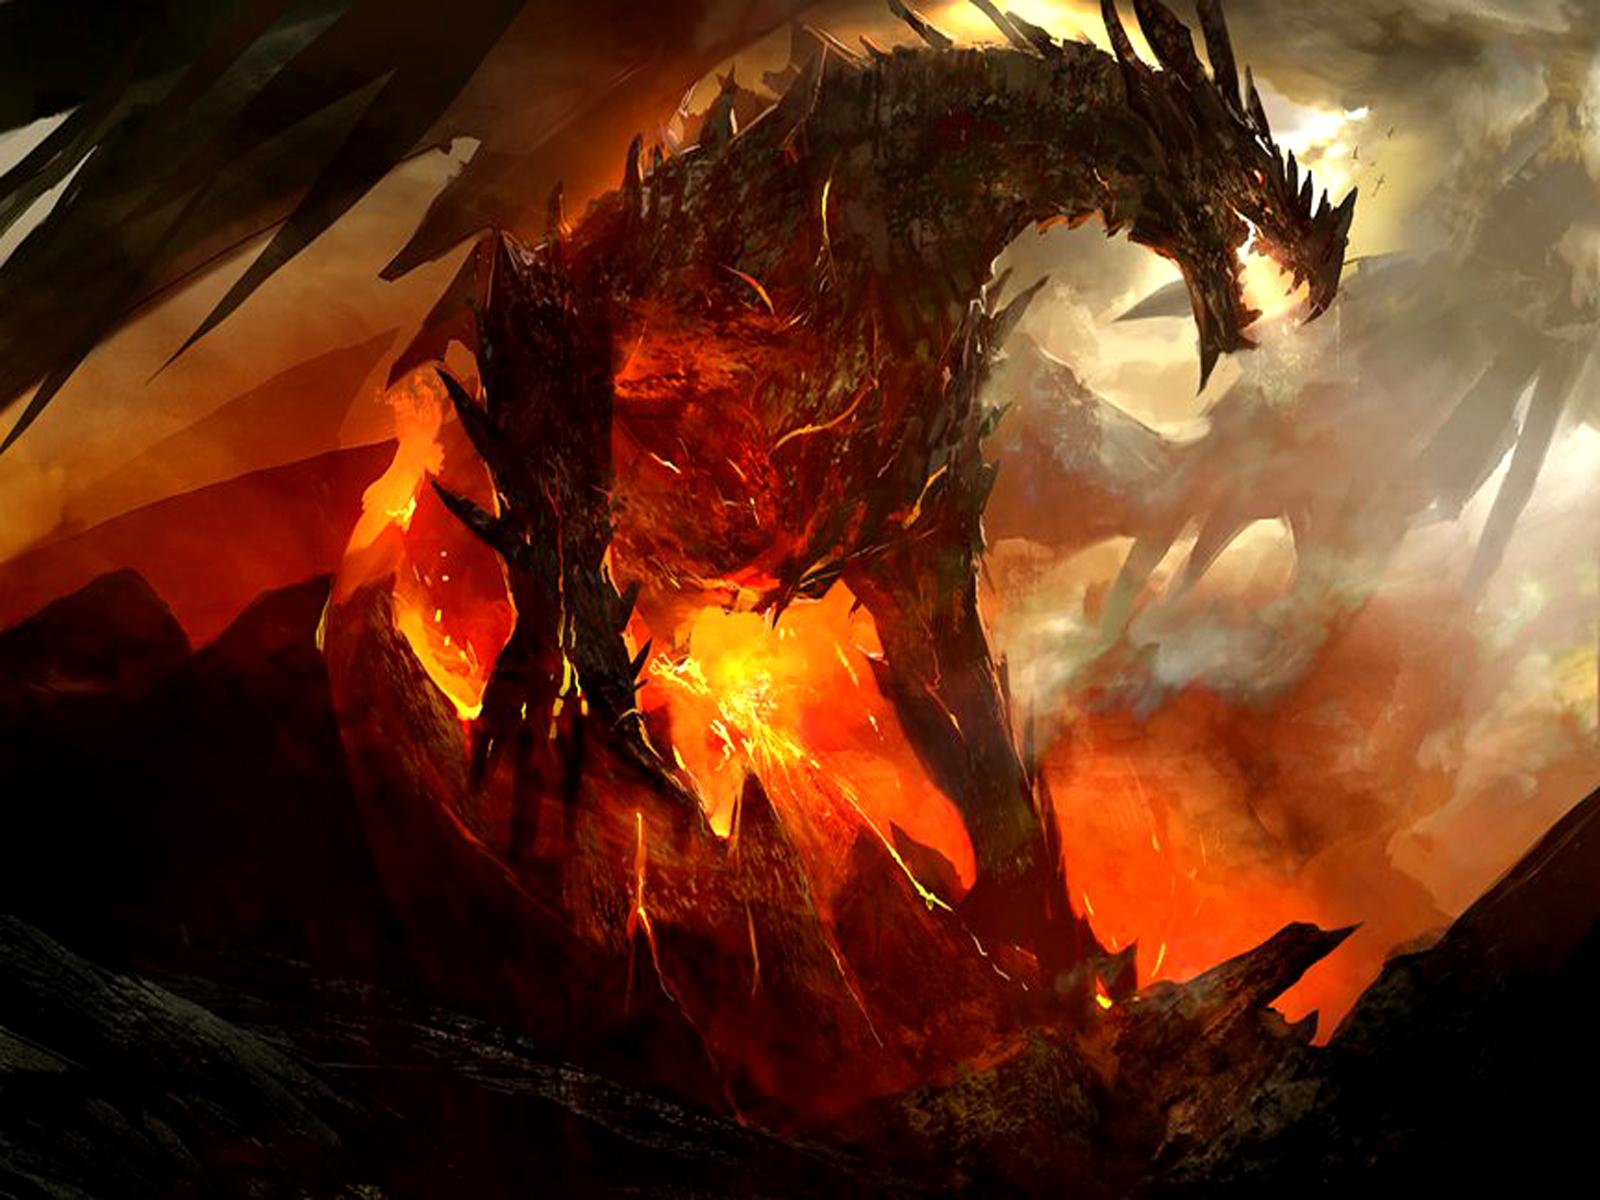 dragon background image dragon desktop wallpapers dragon hd wallpapers 1600x1200